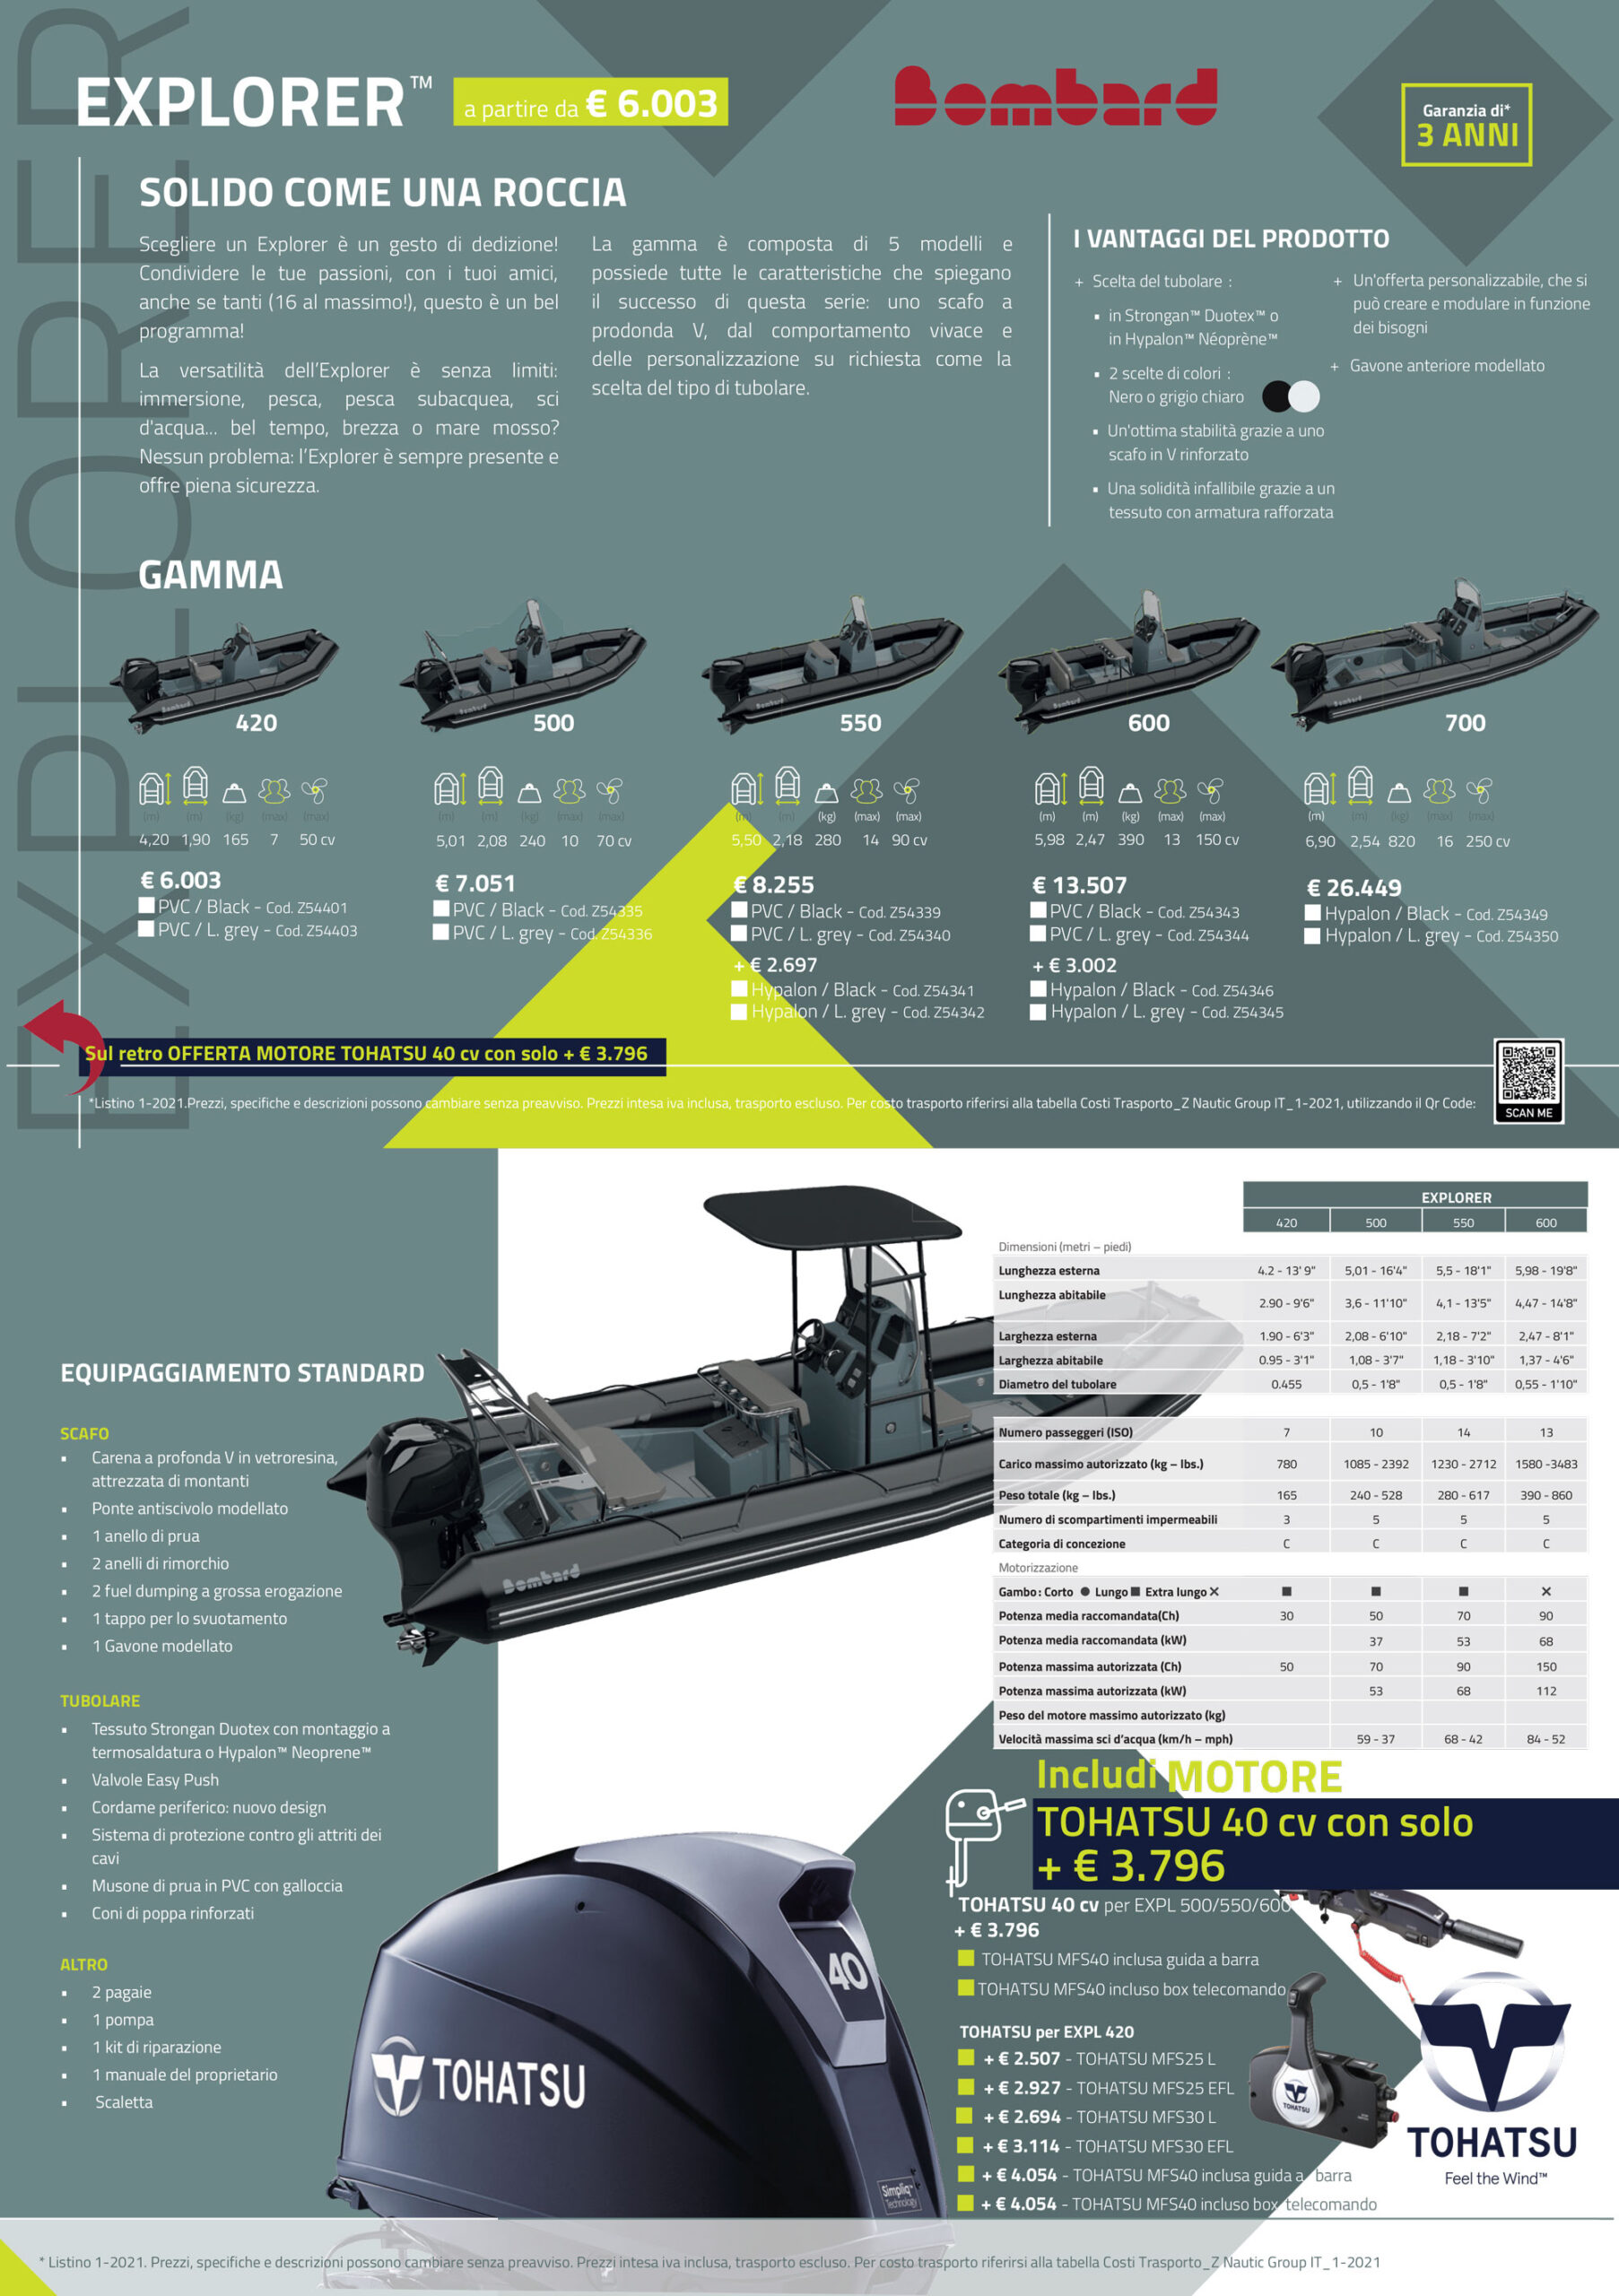 Pakage Tohatsu Explorer 2021 1 scaled